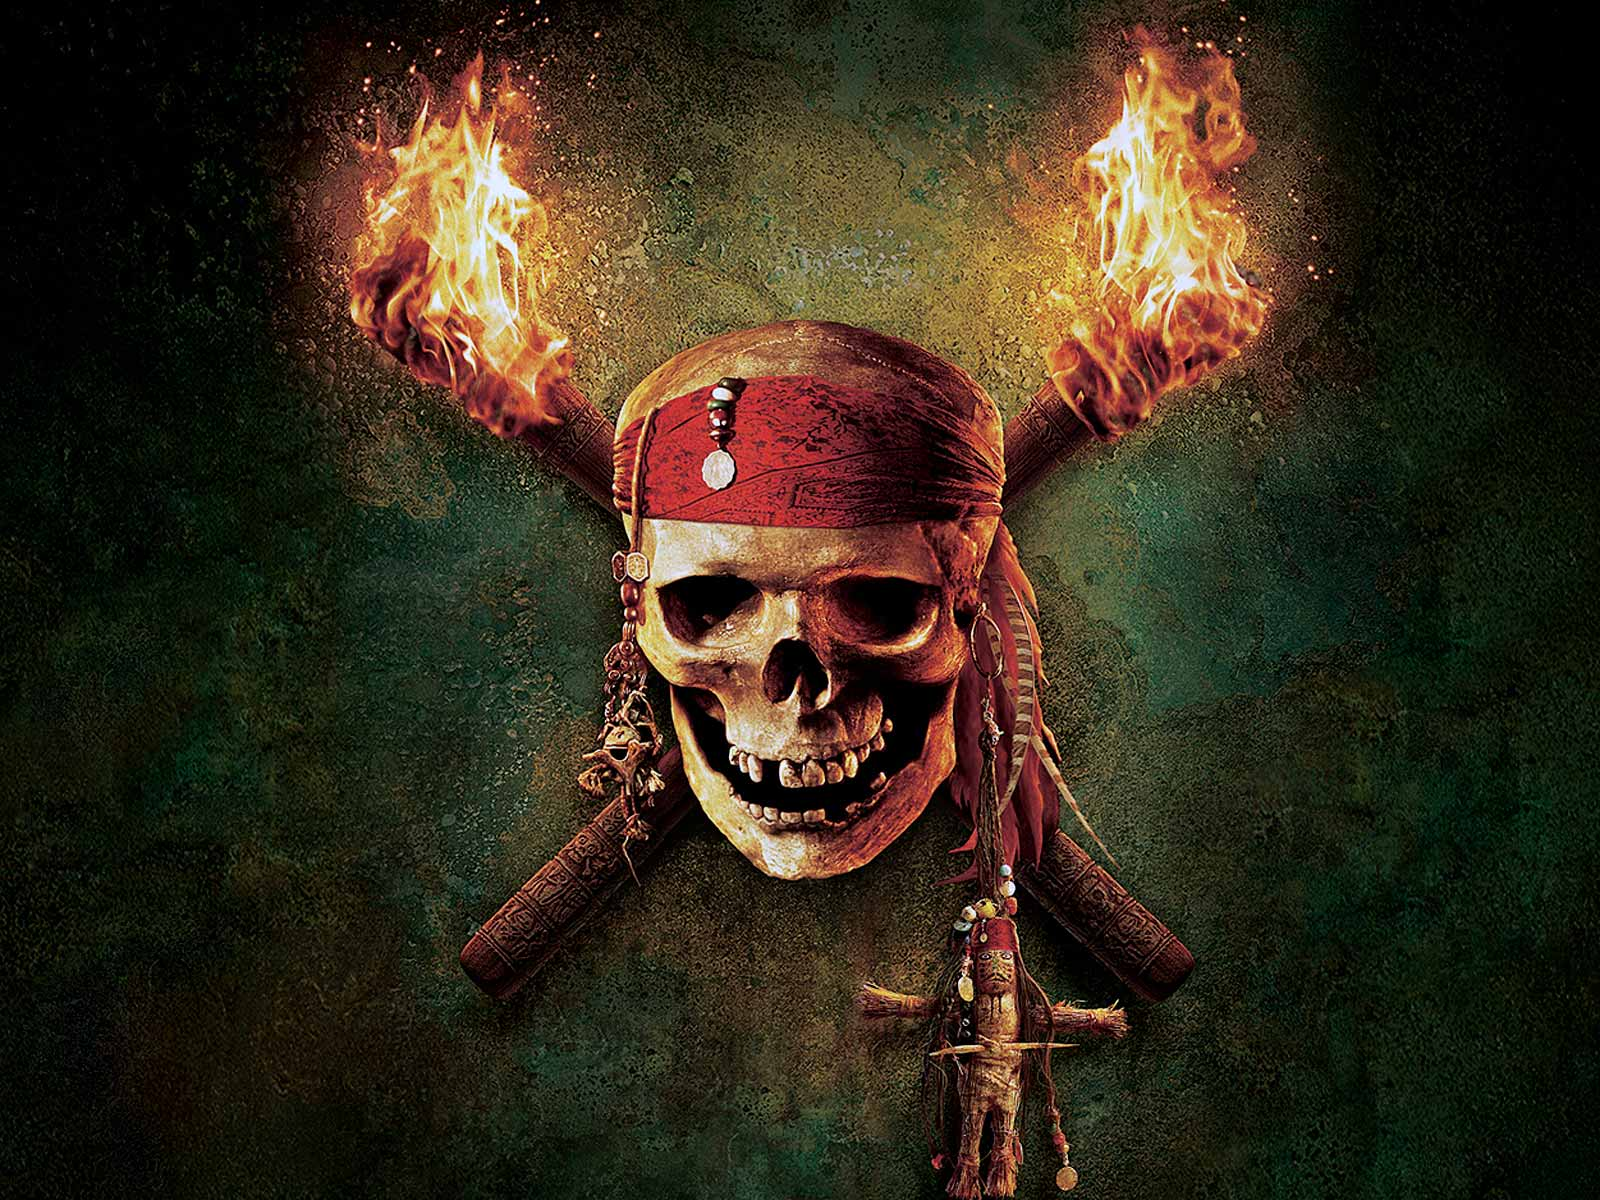 Skull   HD Action Movie Wallpapers   Pirates of Caribbean Skull 1600x1200